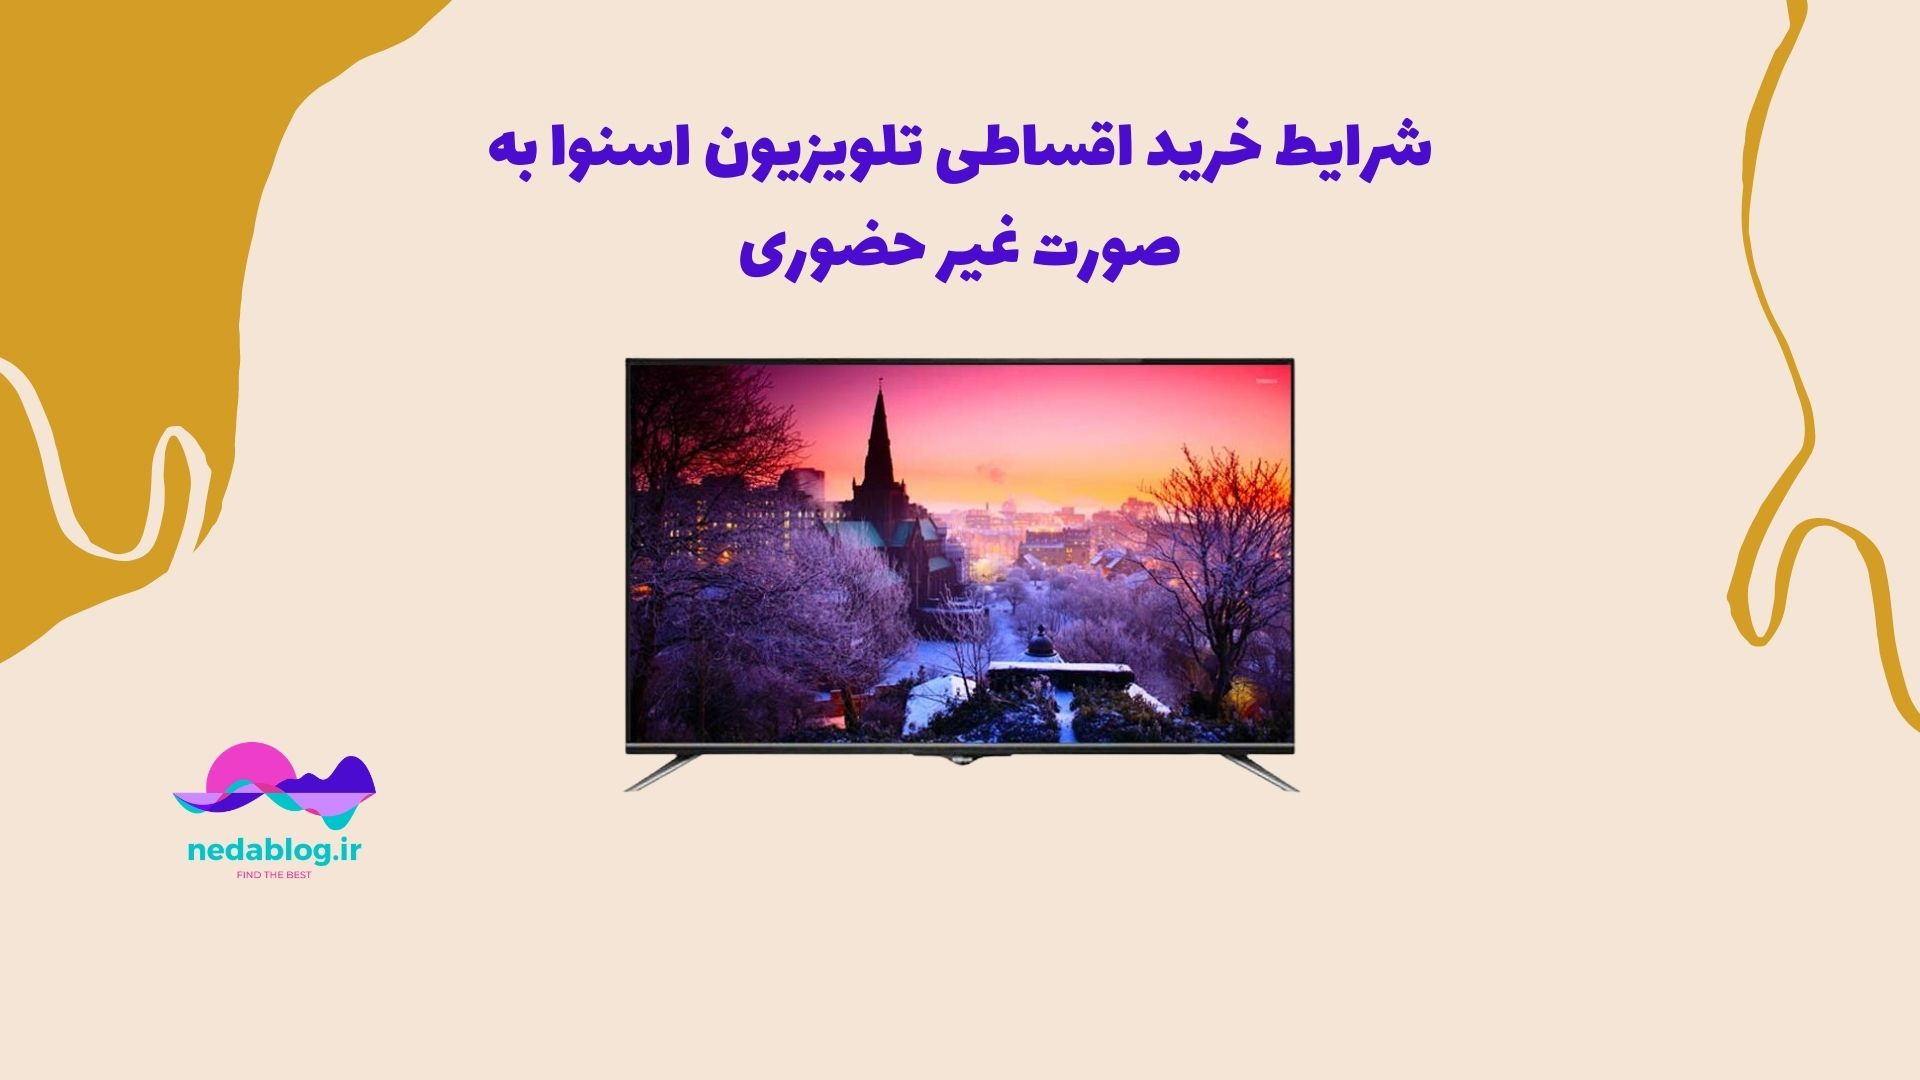 شرایط خرید اقساطی تلویزیون اسنوا به صورت غیر حضوری